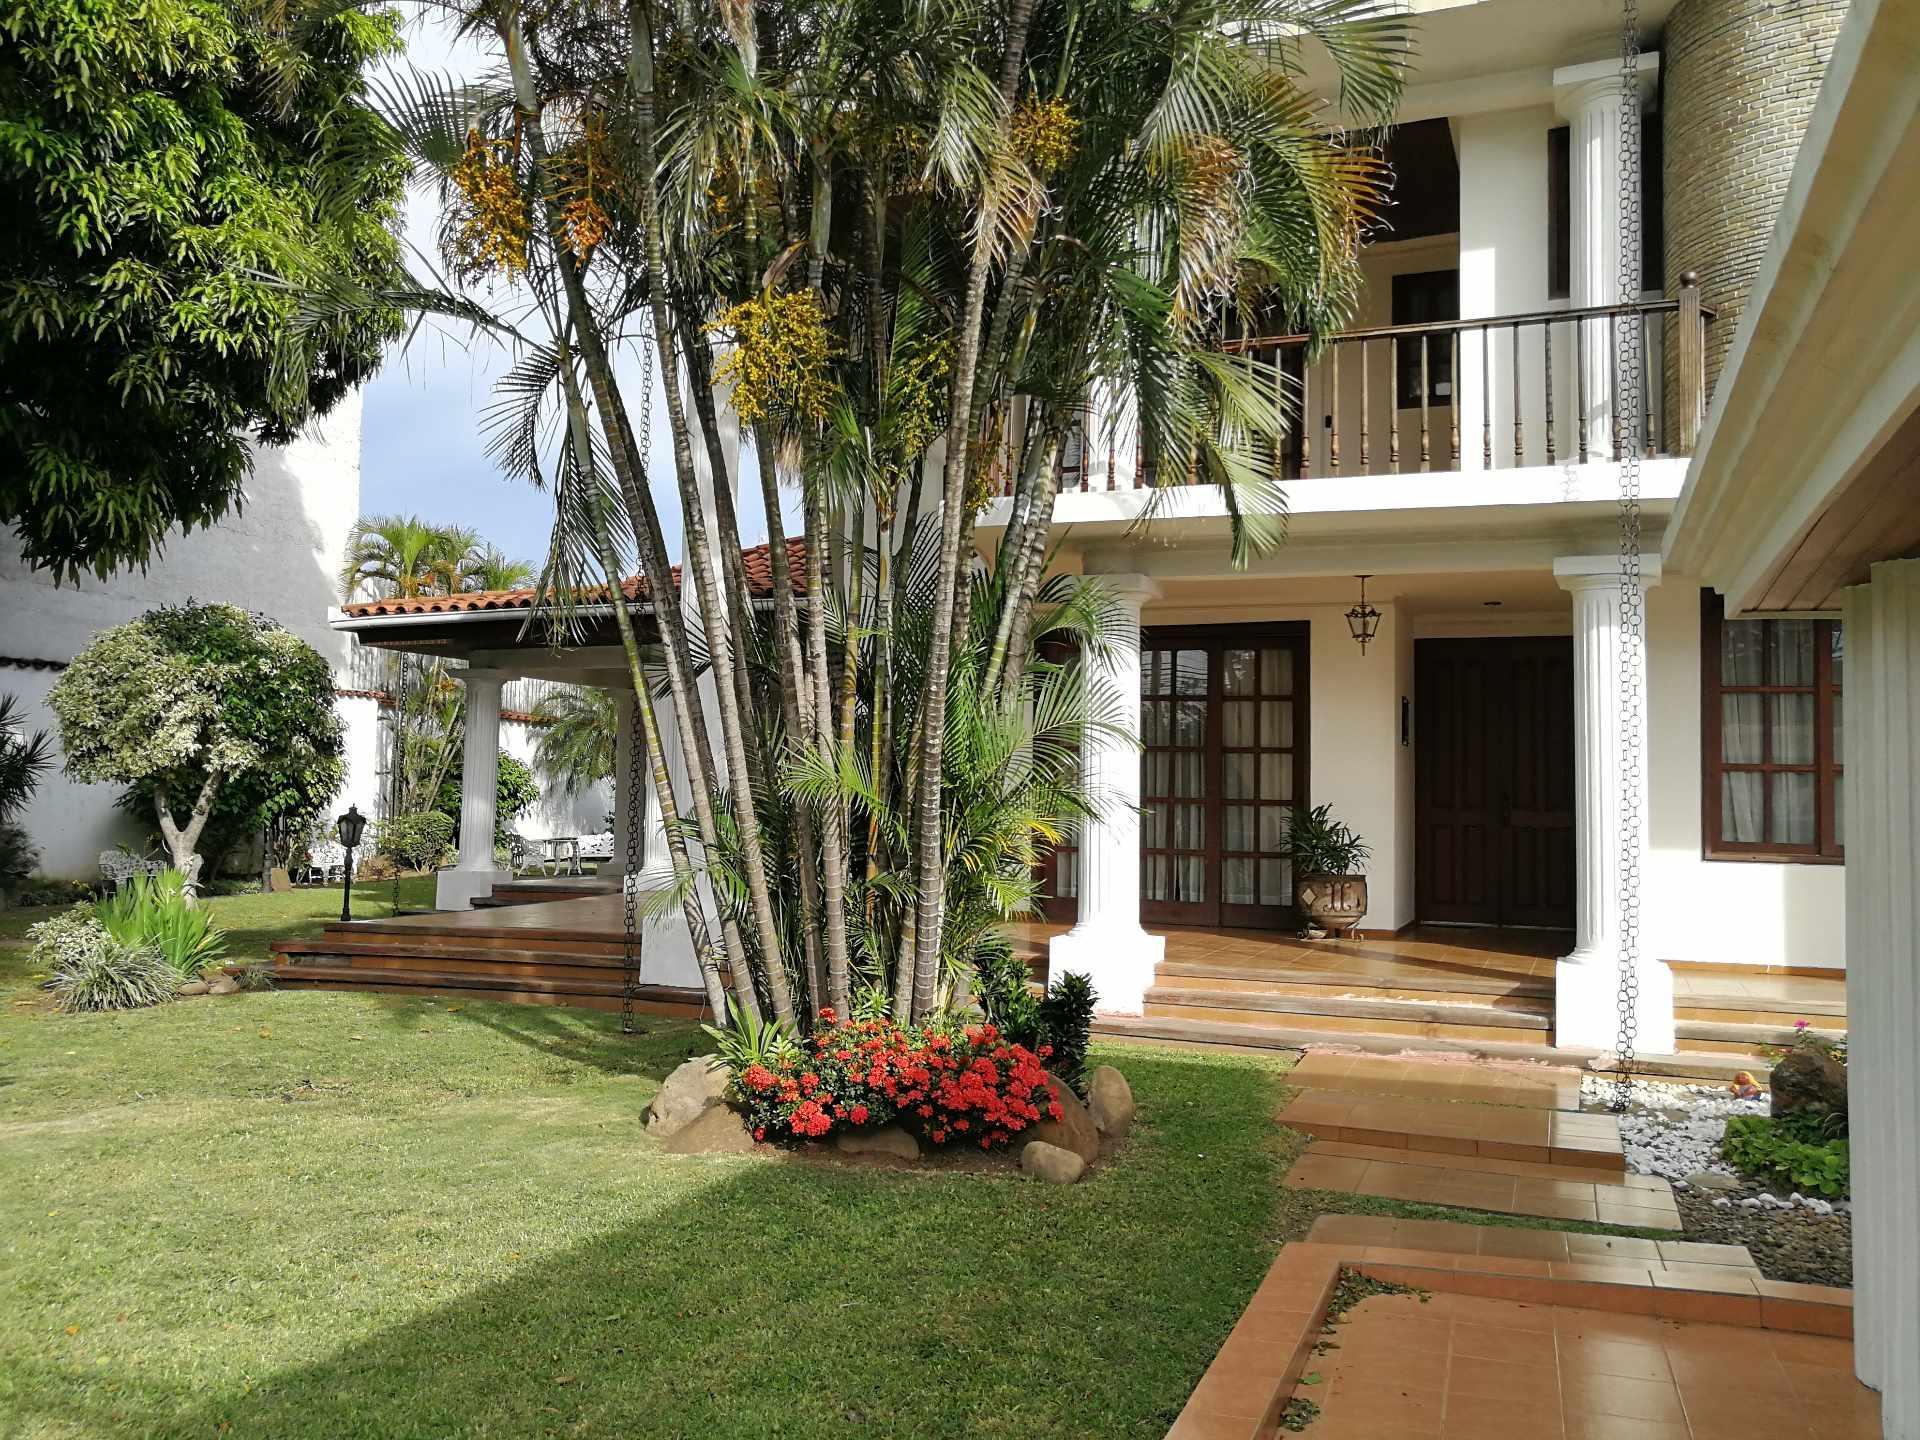 Casa en Venta ZONA SUR - SOBRE SOBRE SEGUNDO ANILLO PARQUE URBANO Foto 1